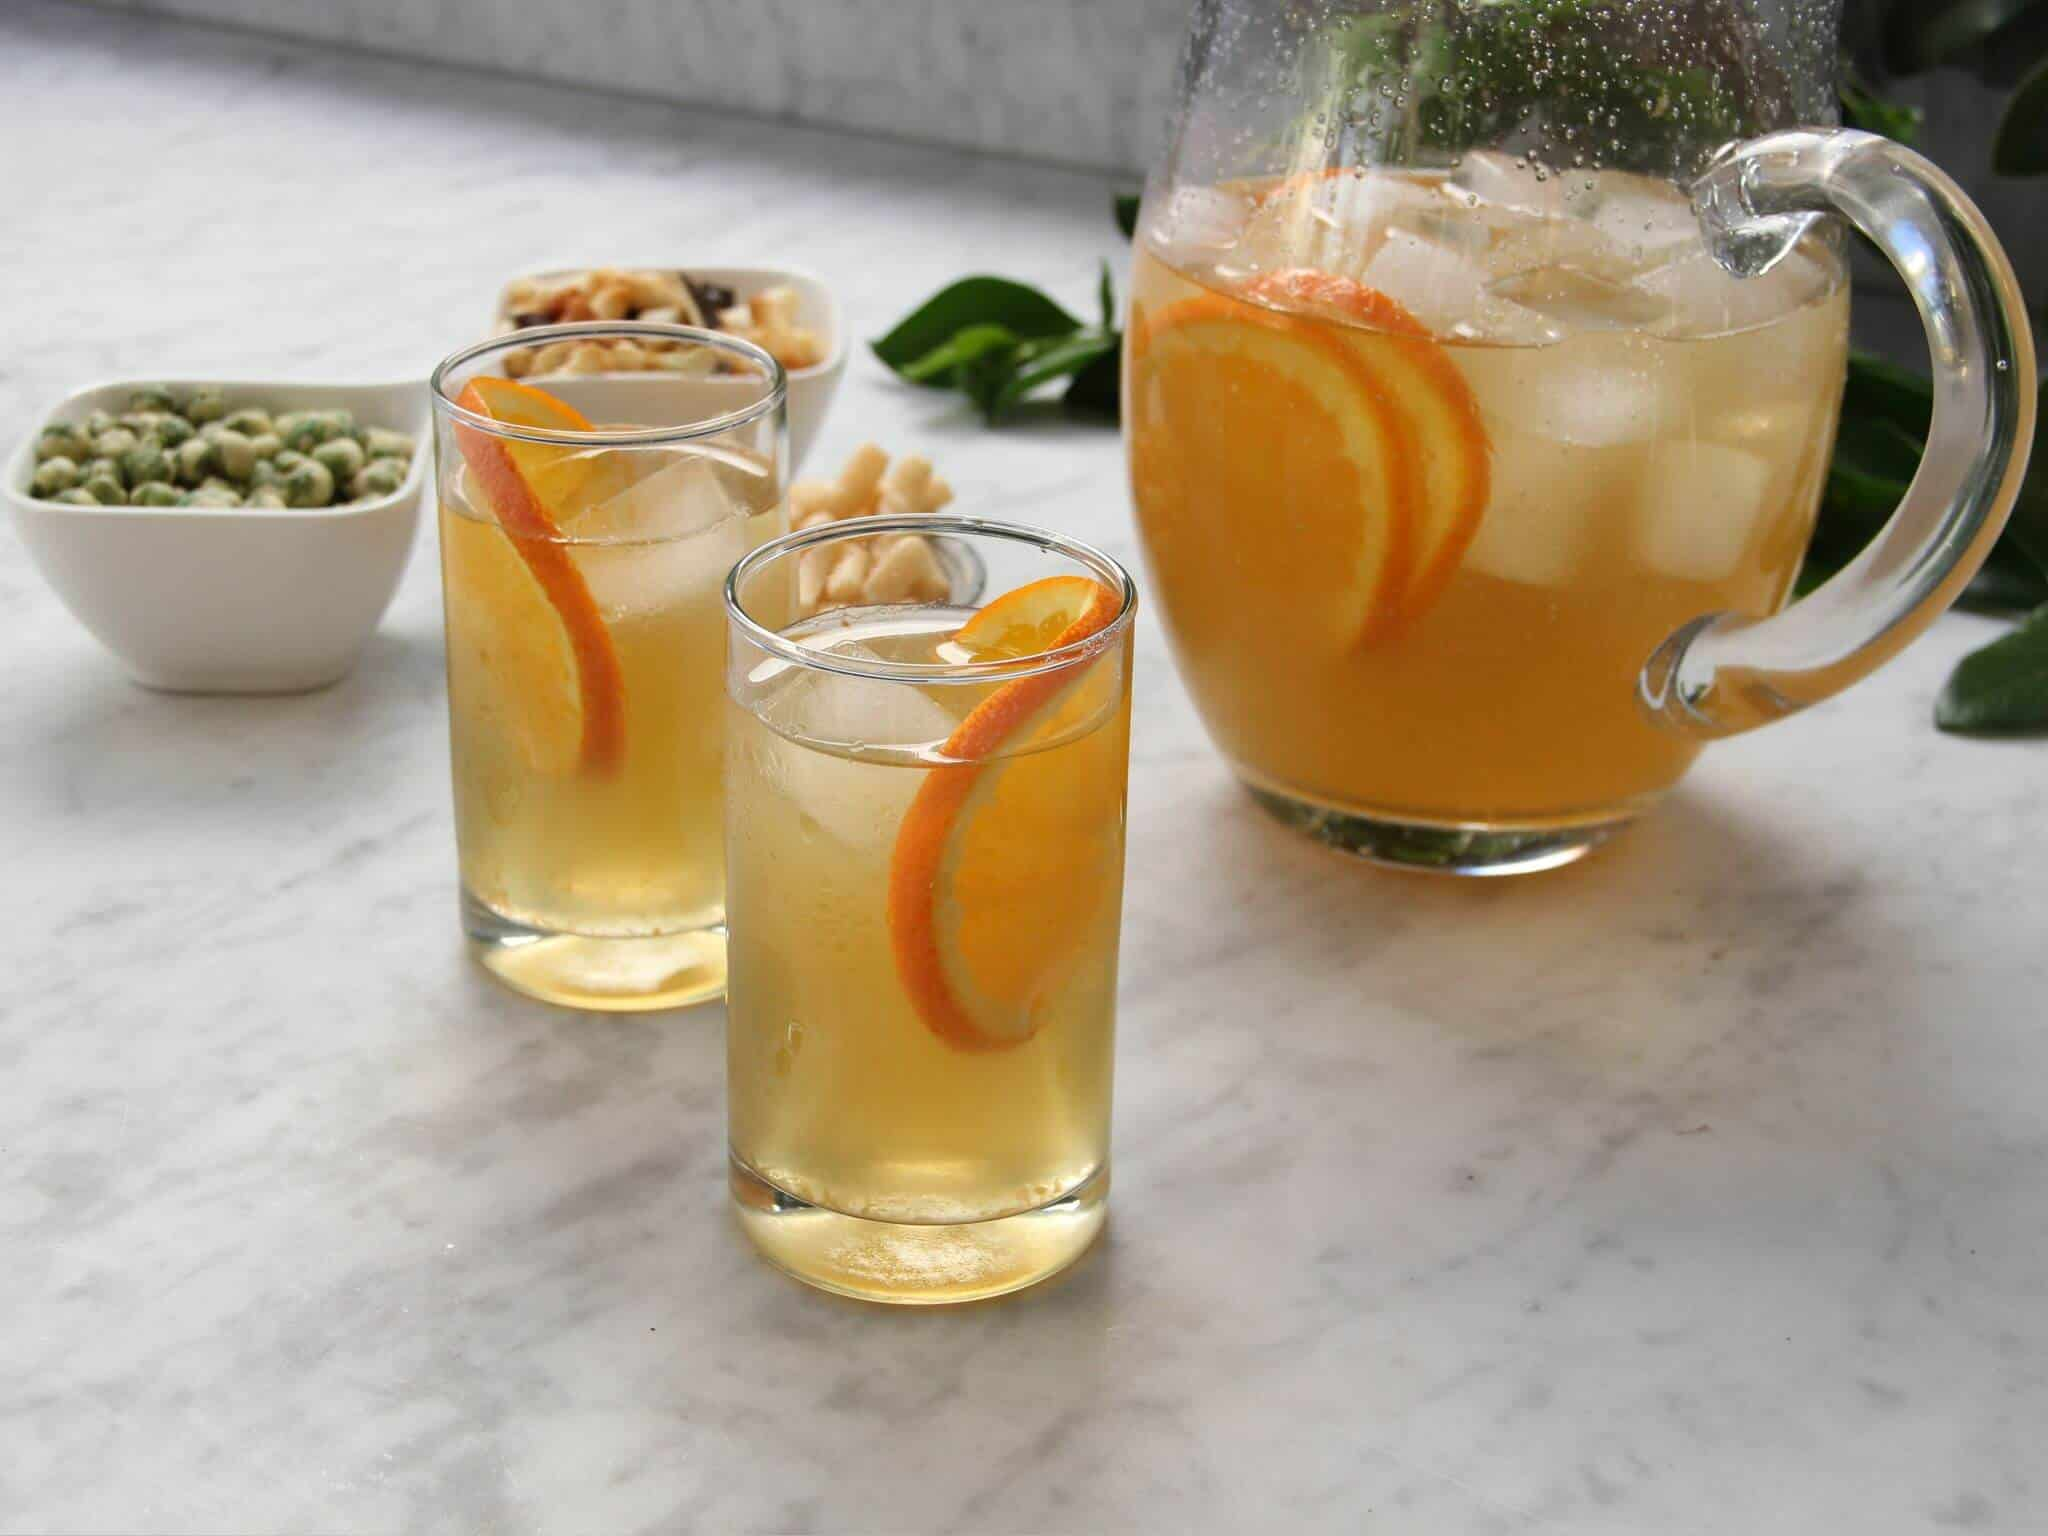 Green Tea and Orange Cooler